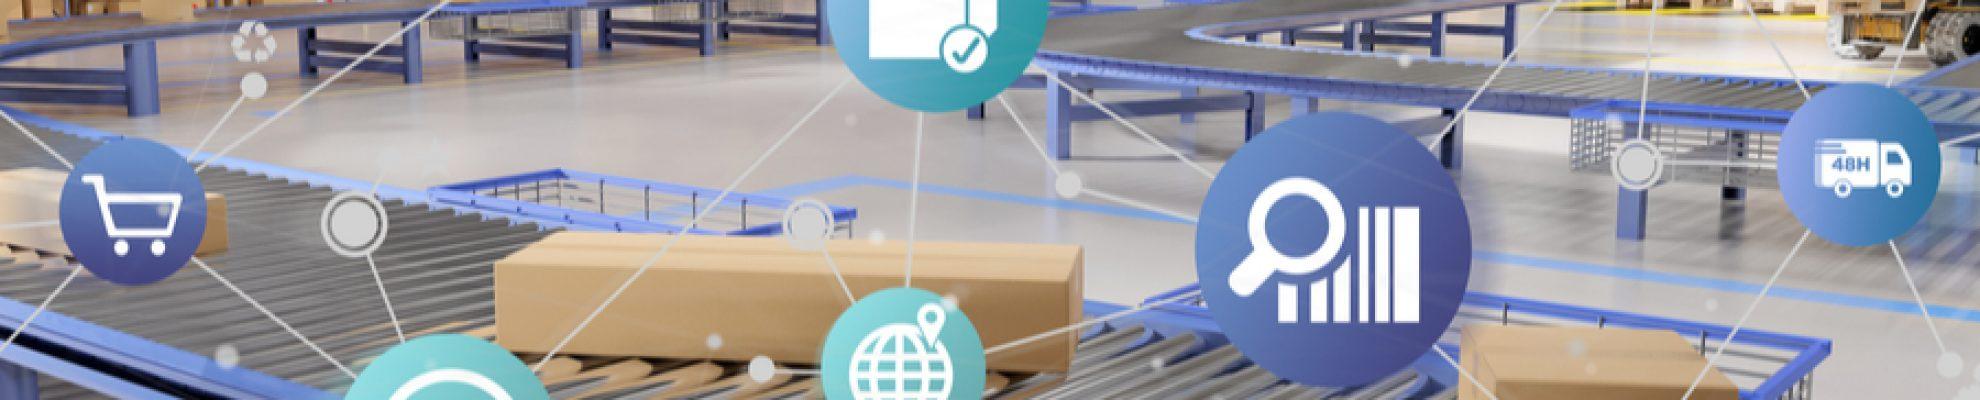 pilotage supply chain